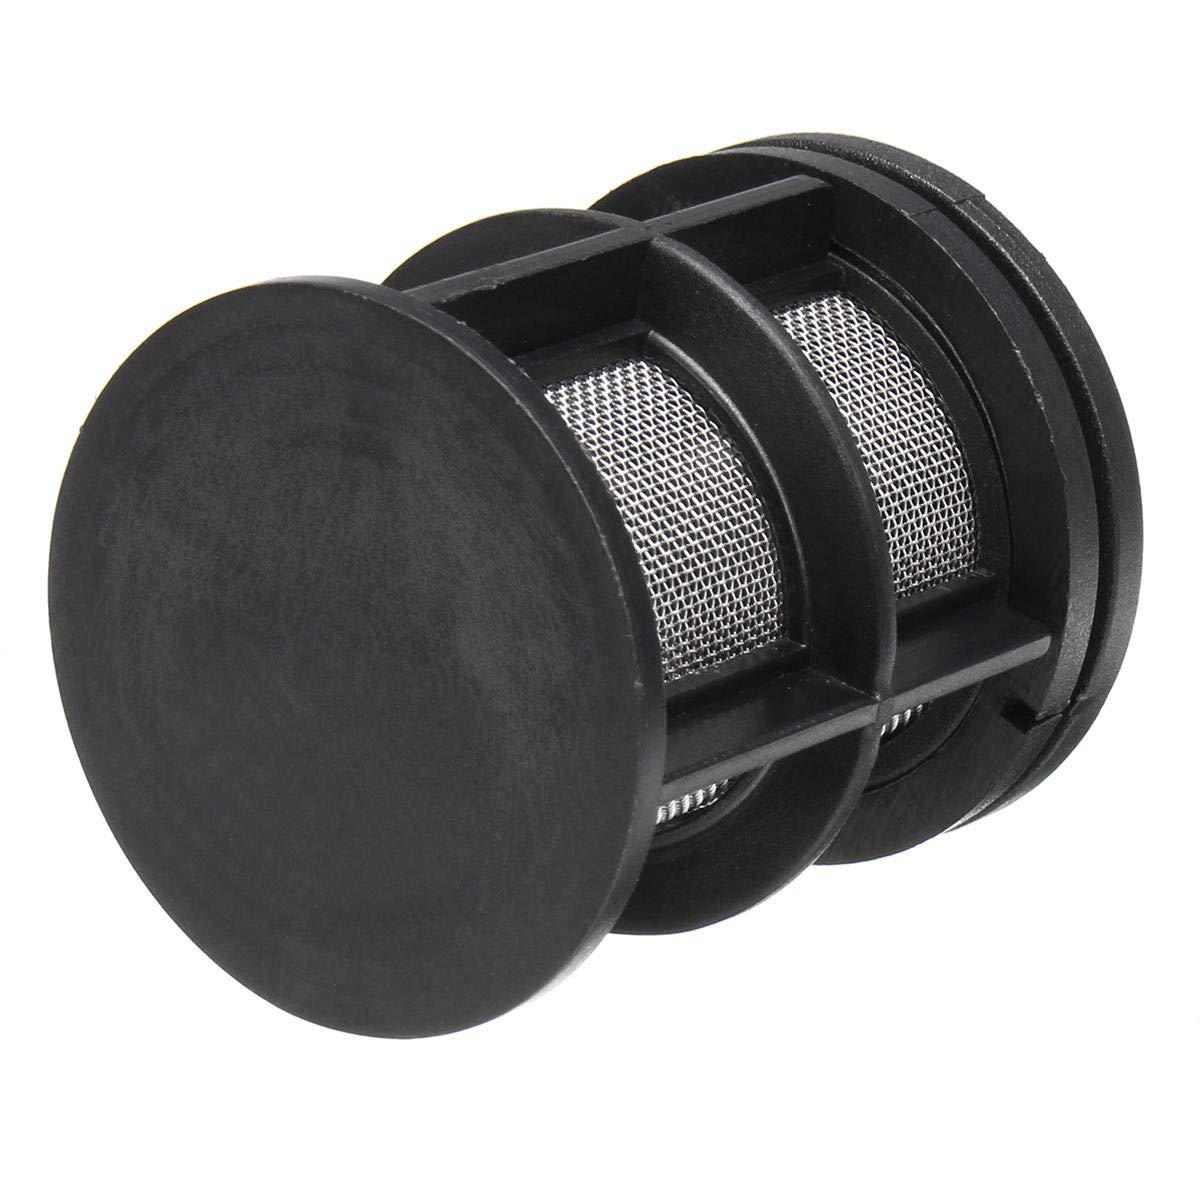 25/mm aspirazione aria filtro silenziatore per Dometic Eberspacher Webasto diesel riscaldante cod